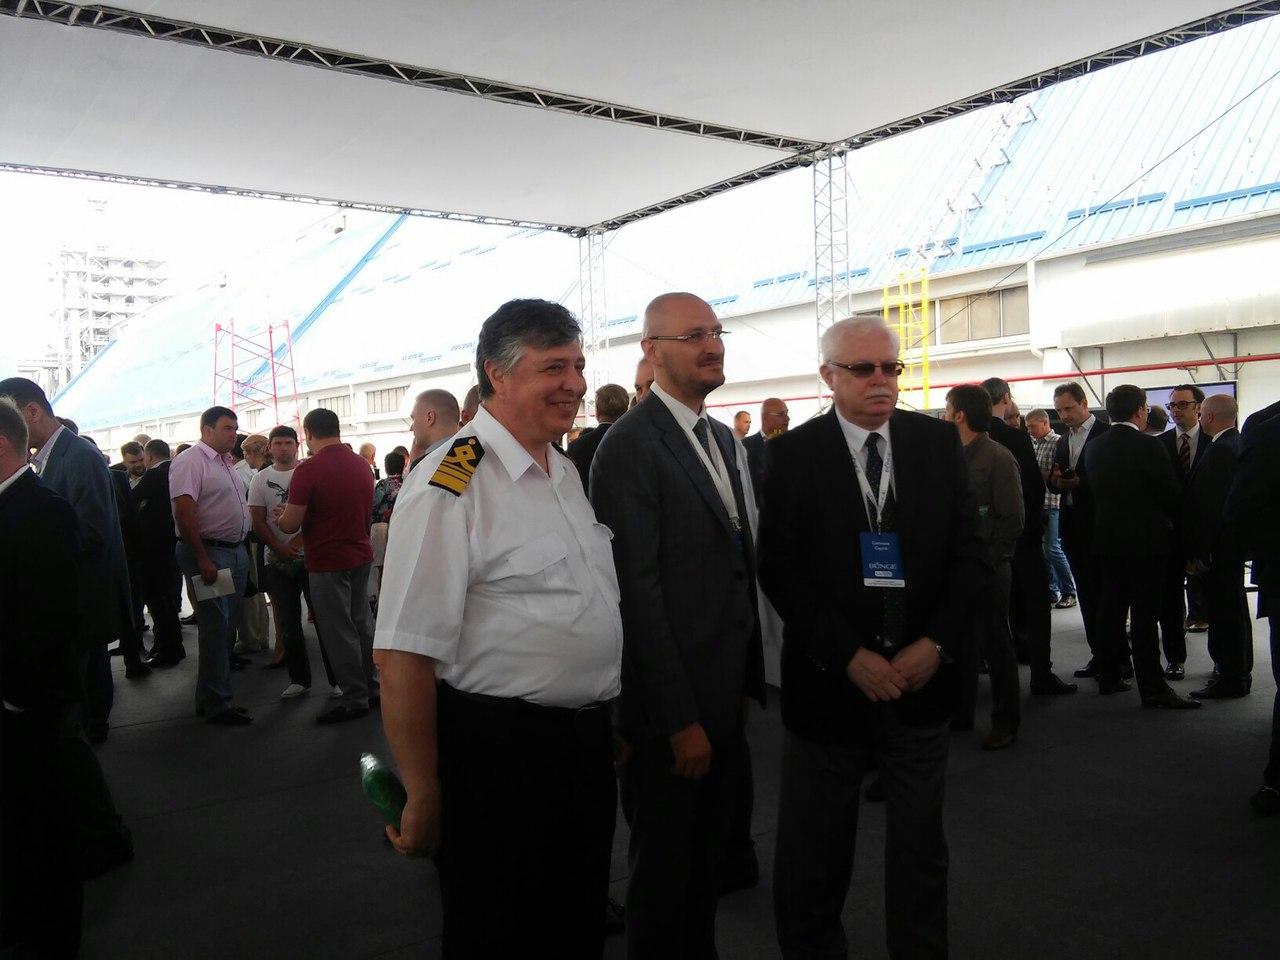 У Миколаївському морпорту з хвилини на хвилину чекають на Порошенка - фото 1